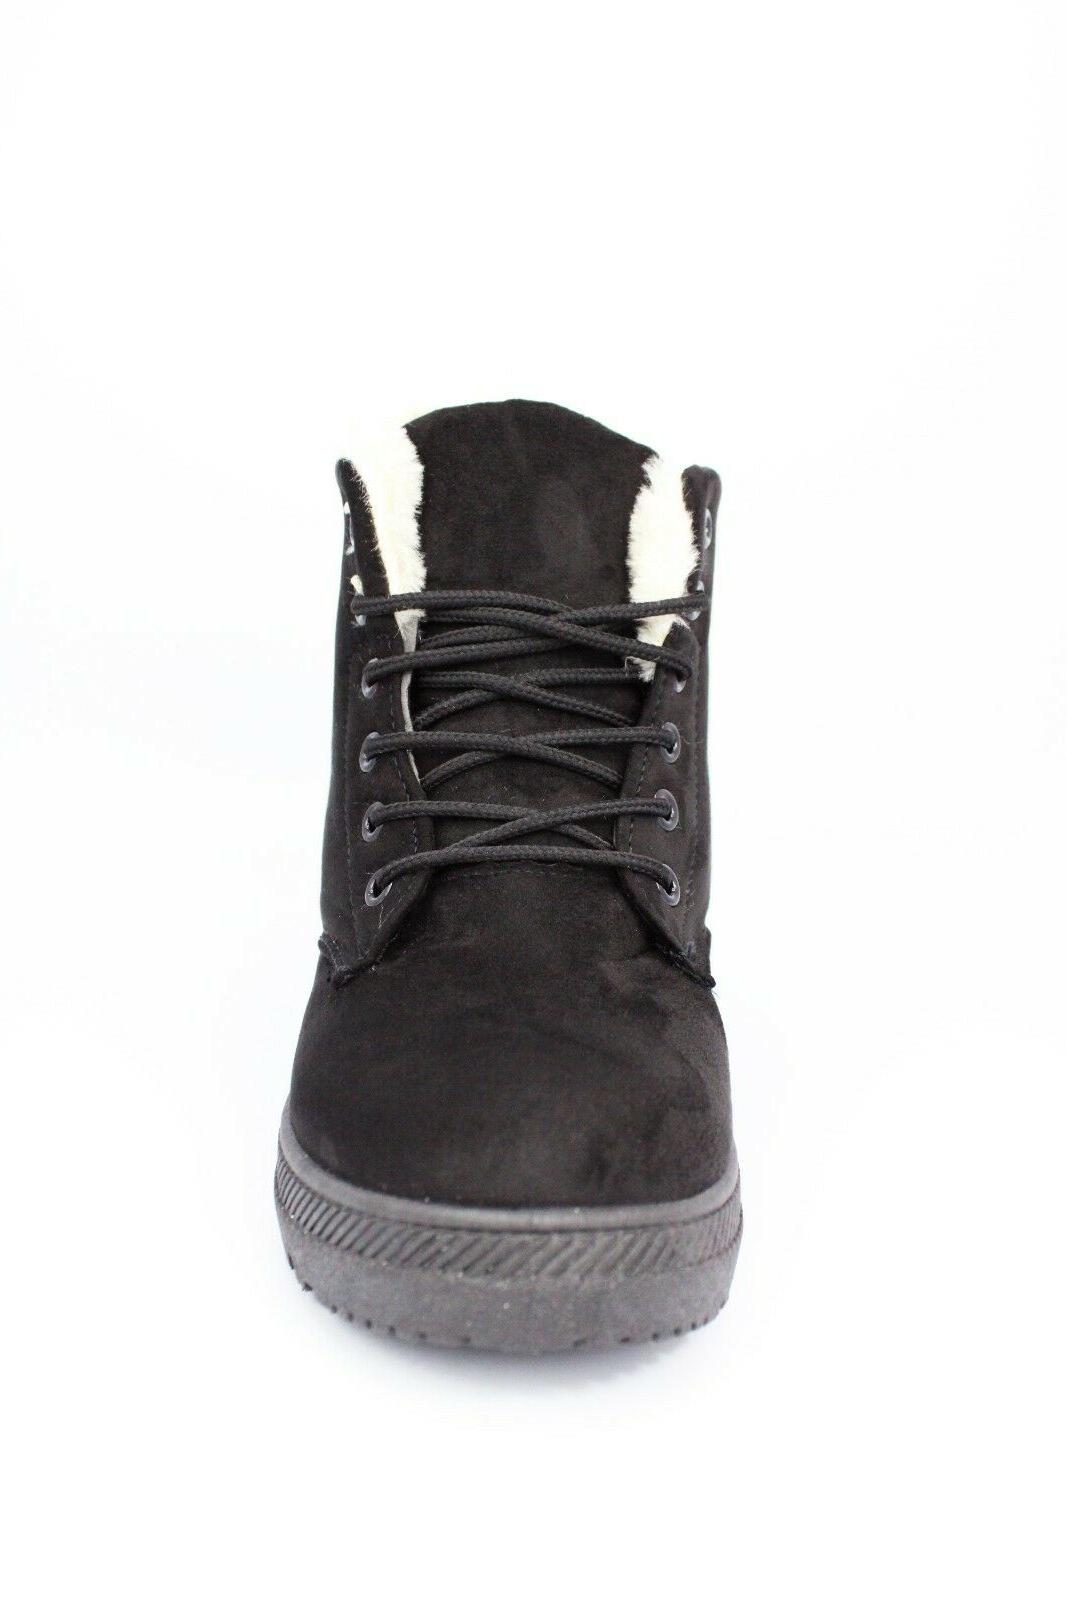 NOT100 Boots Warm Booties, Black, US